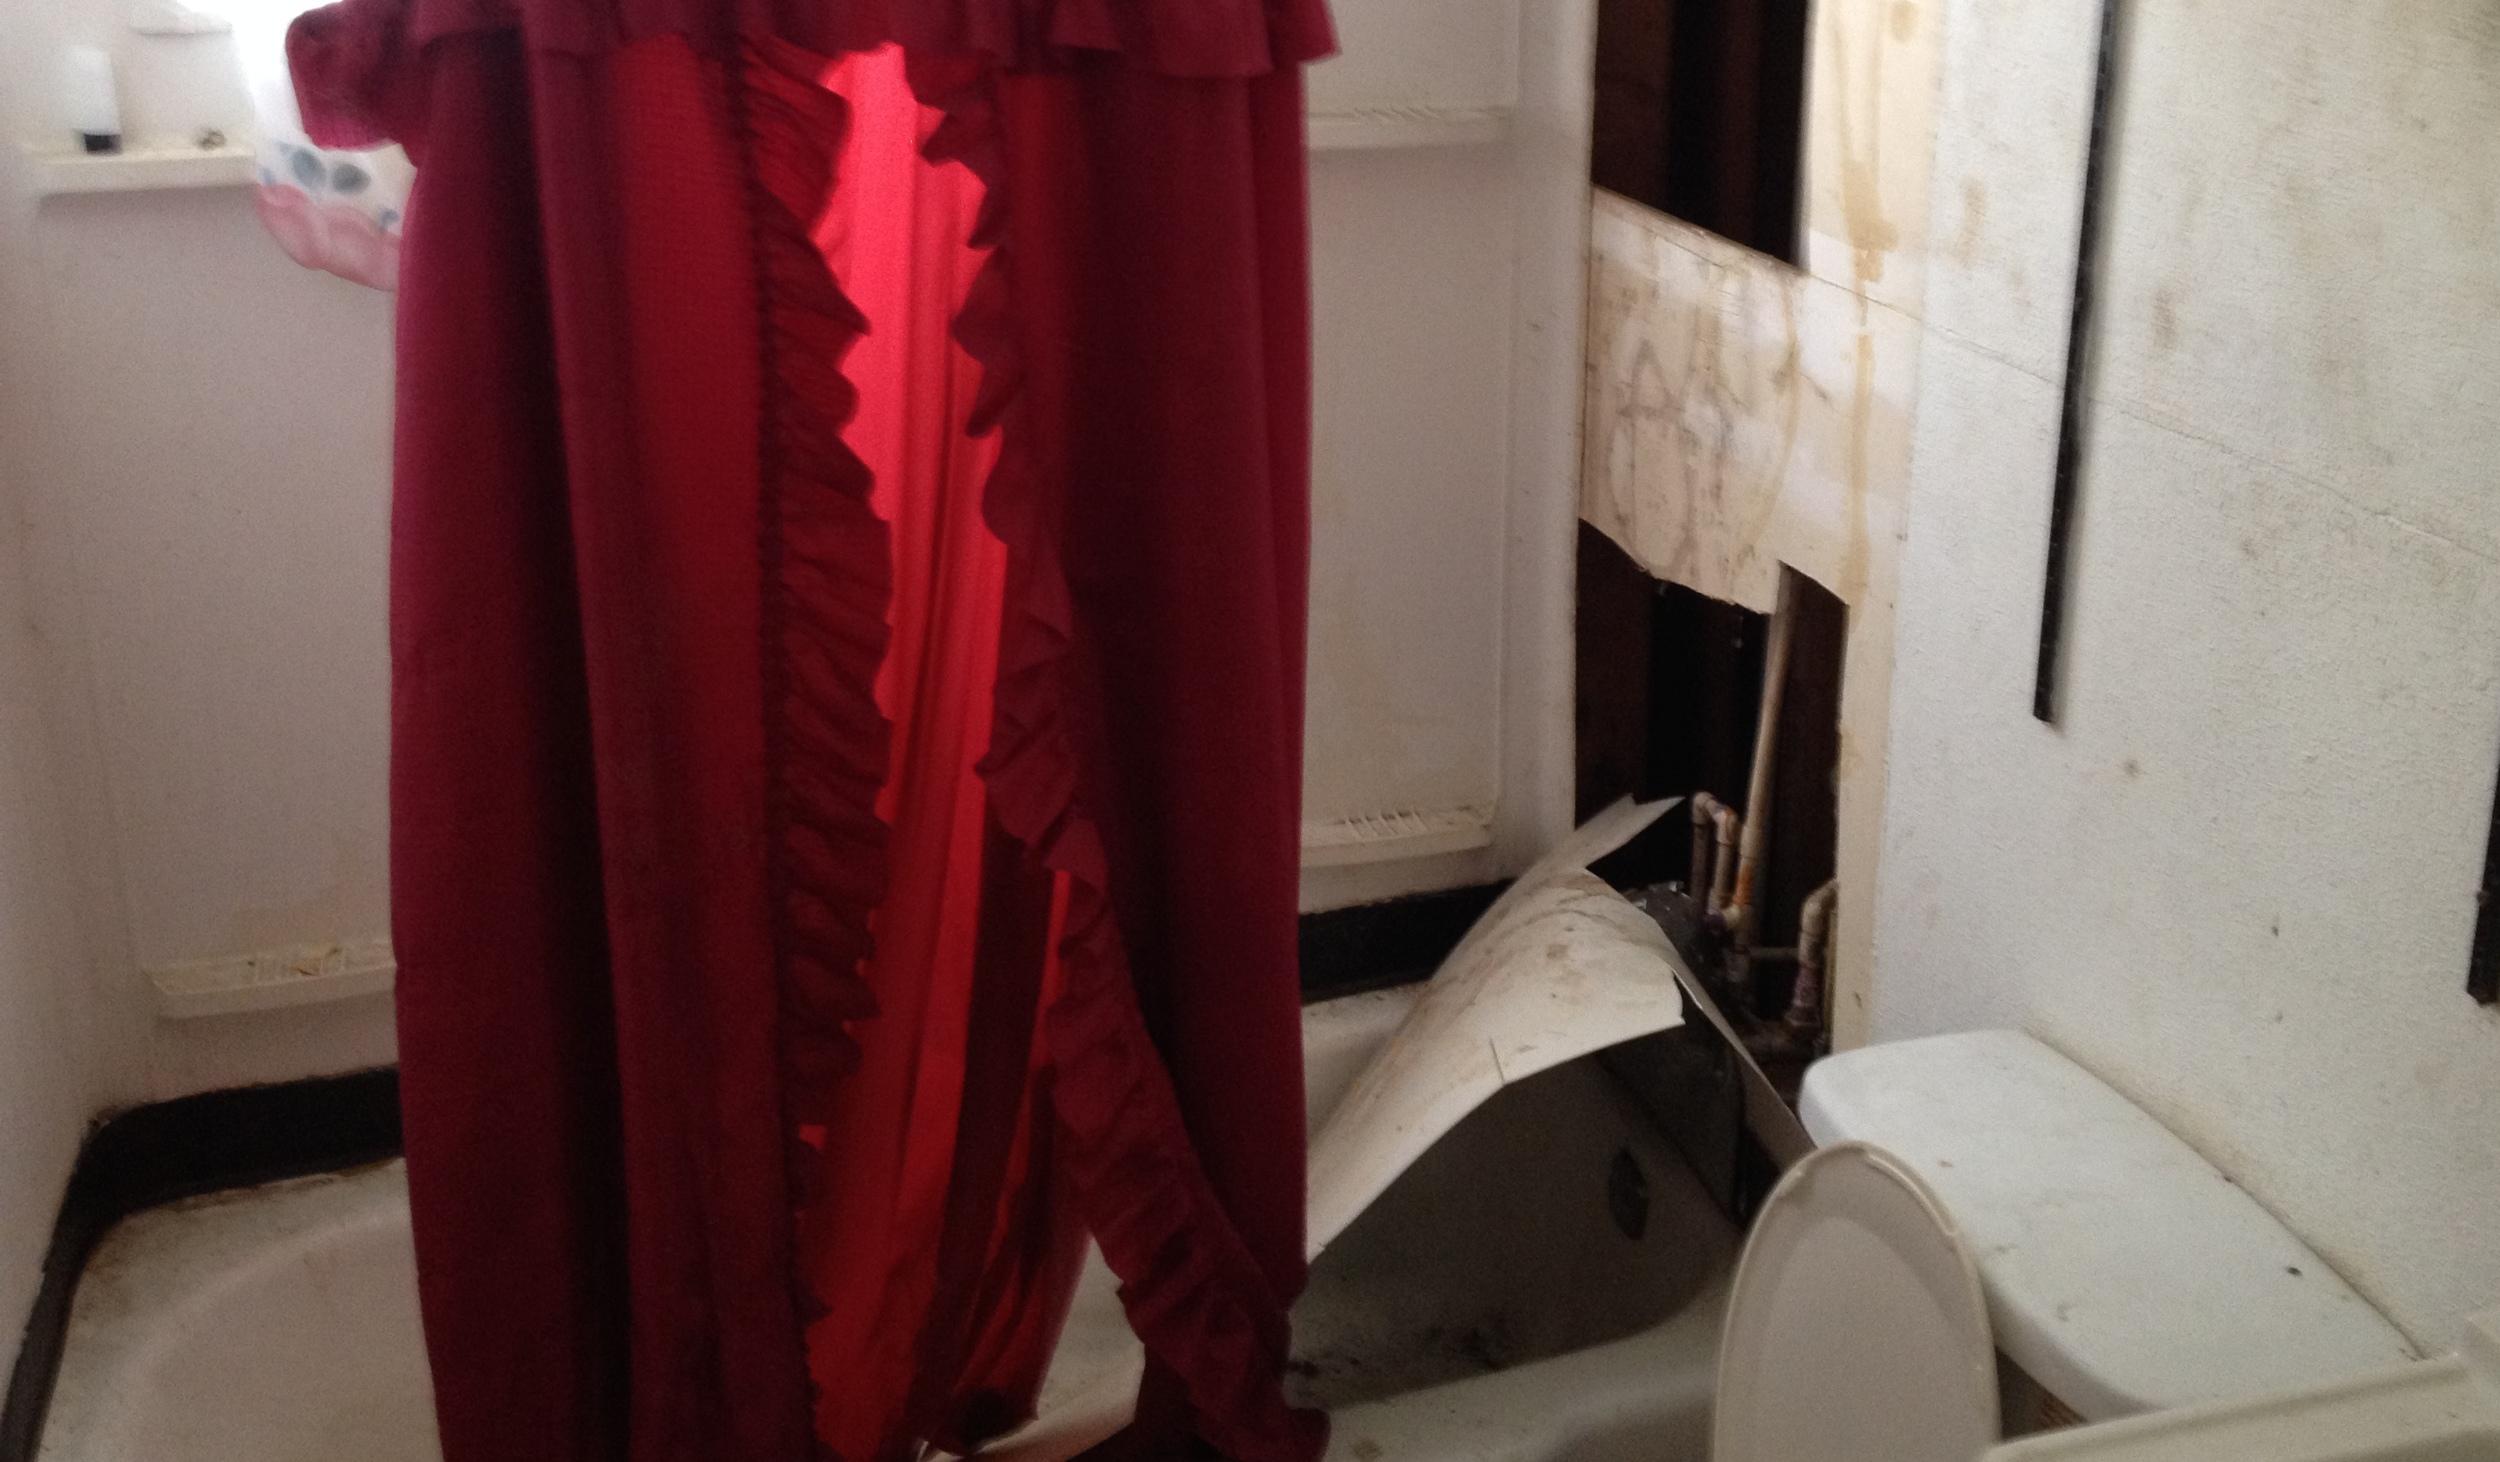 138 York St. Bathroom - Original Condition